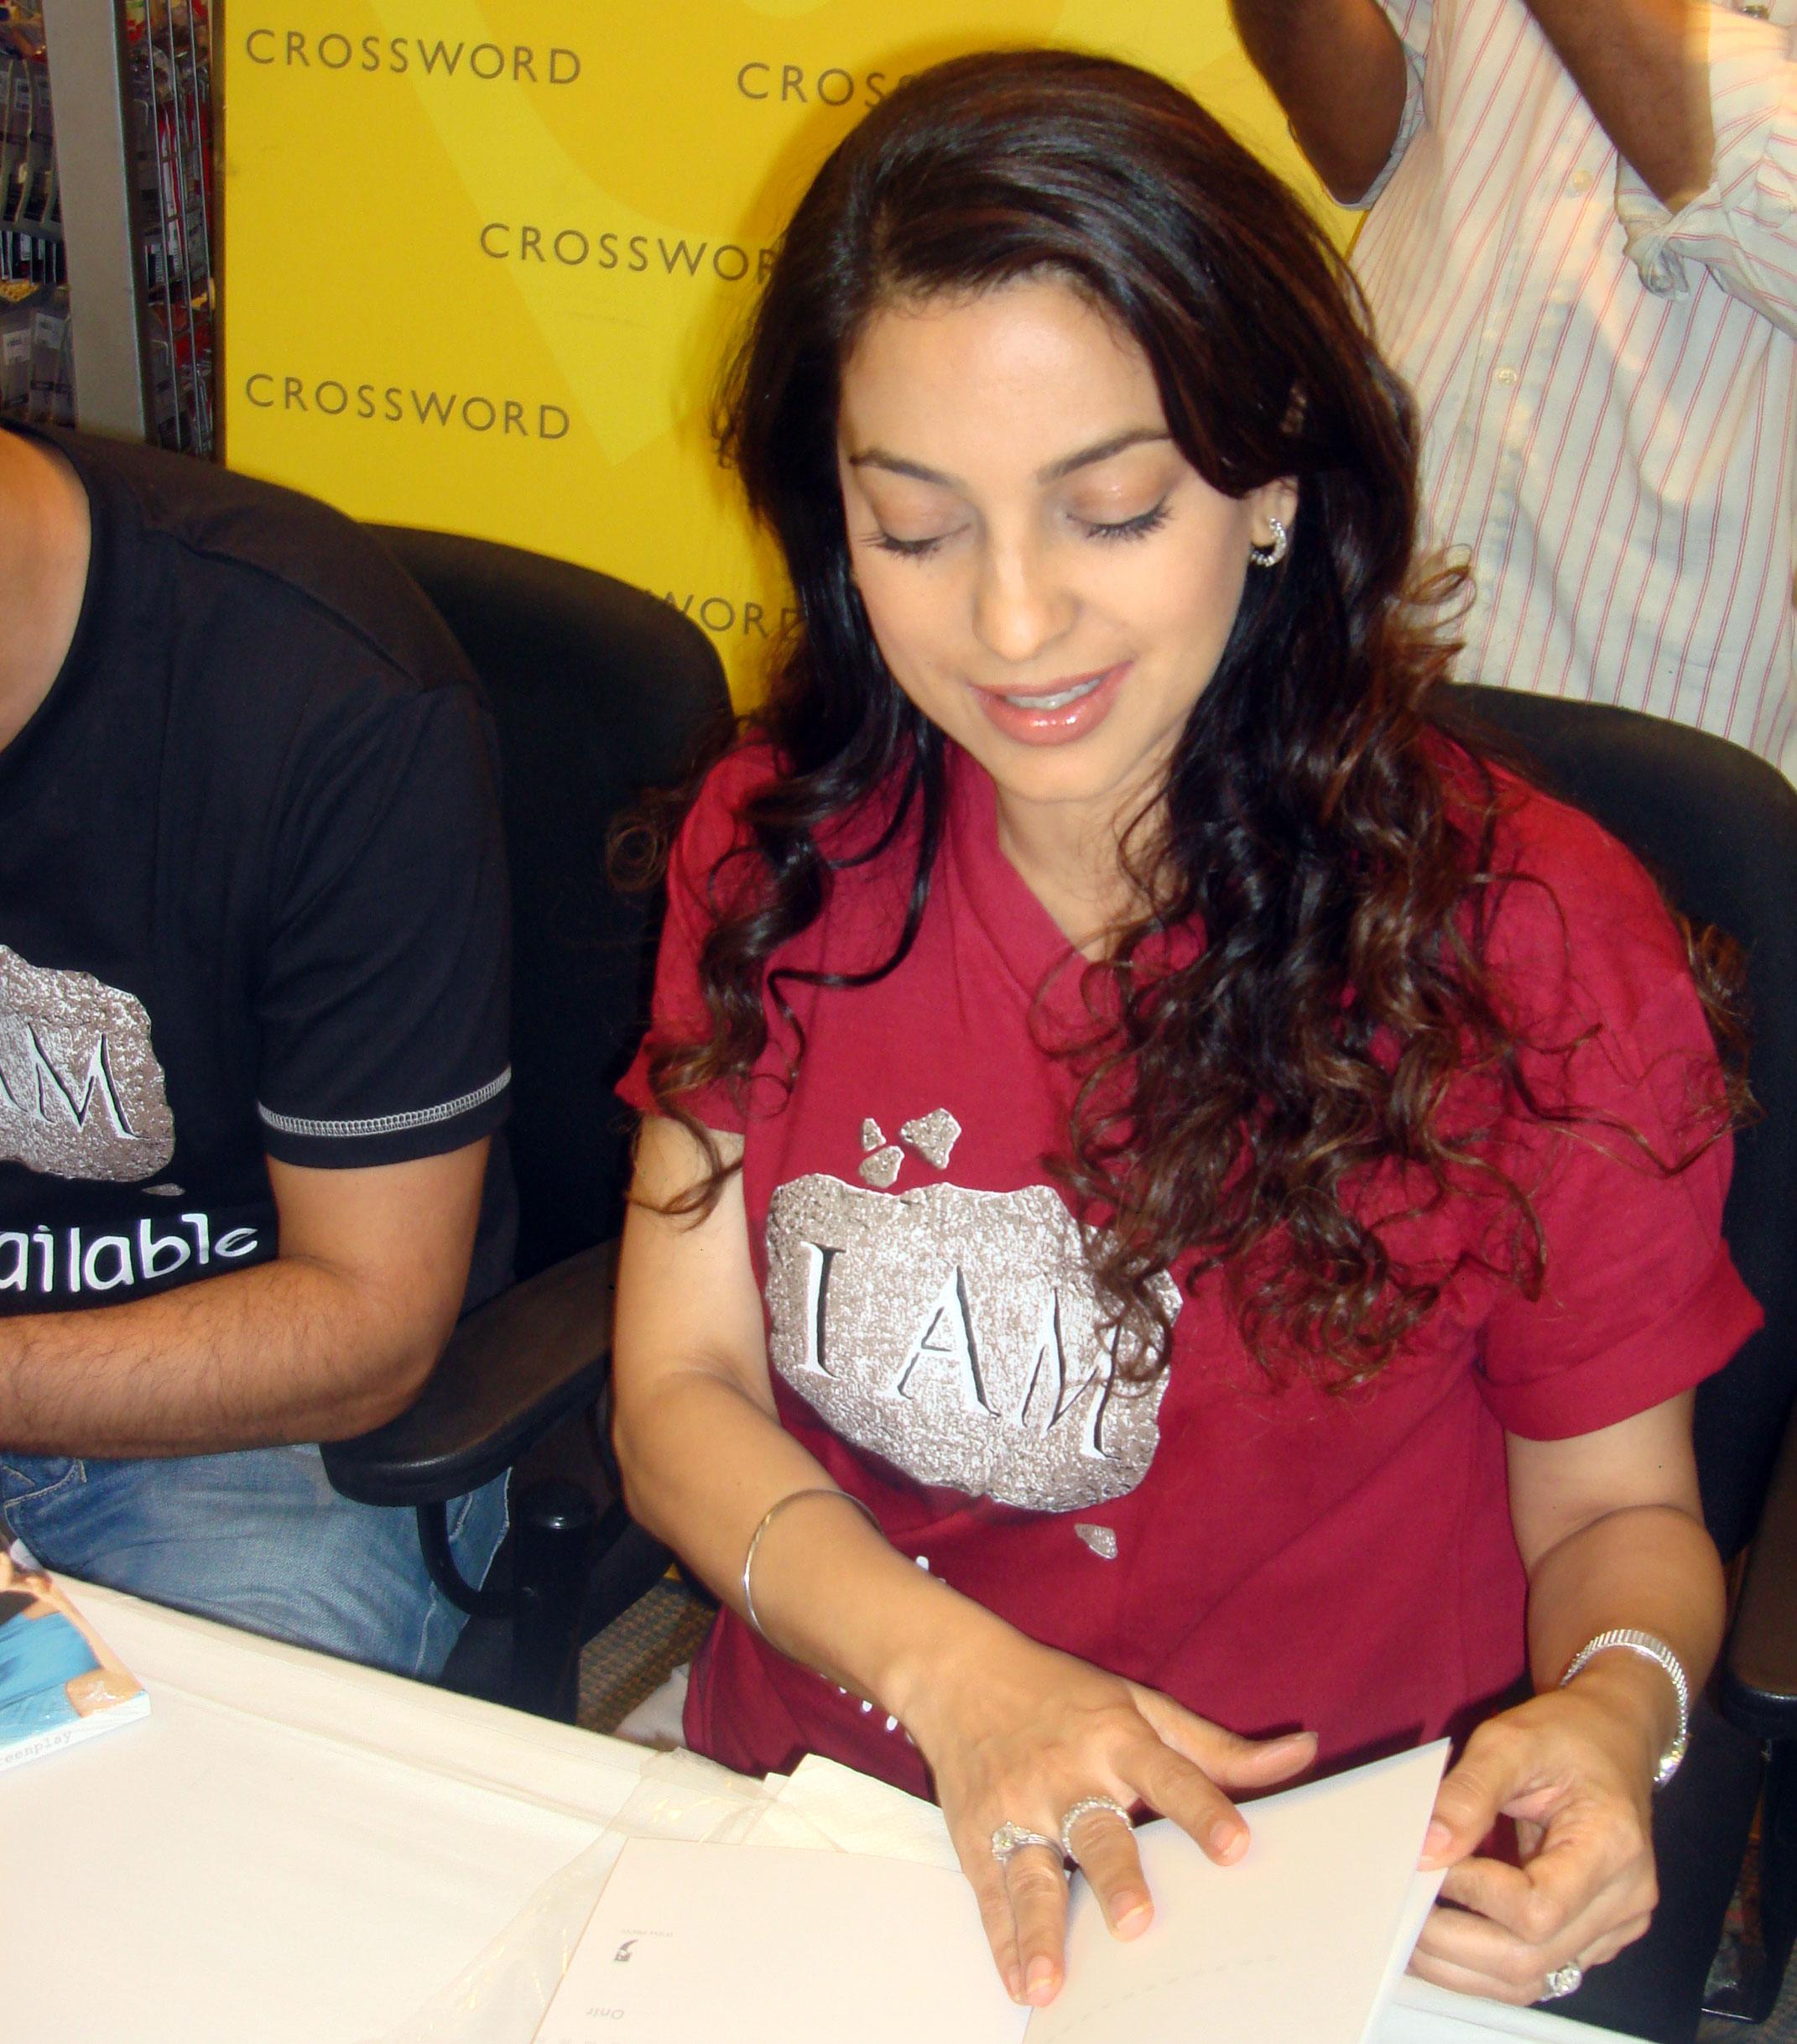 kashmira and krishna relationship help